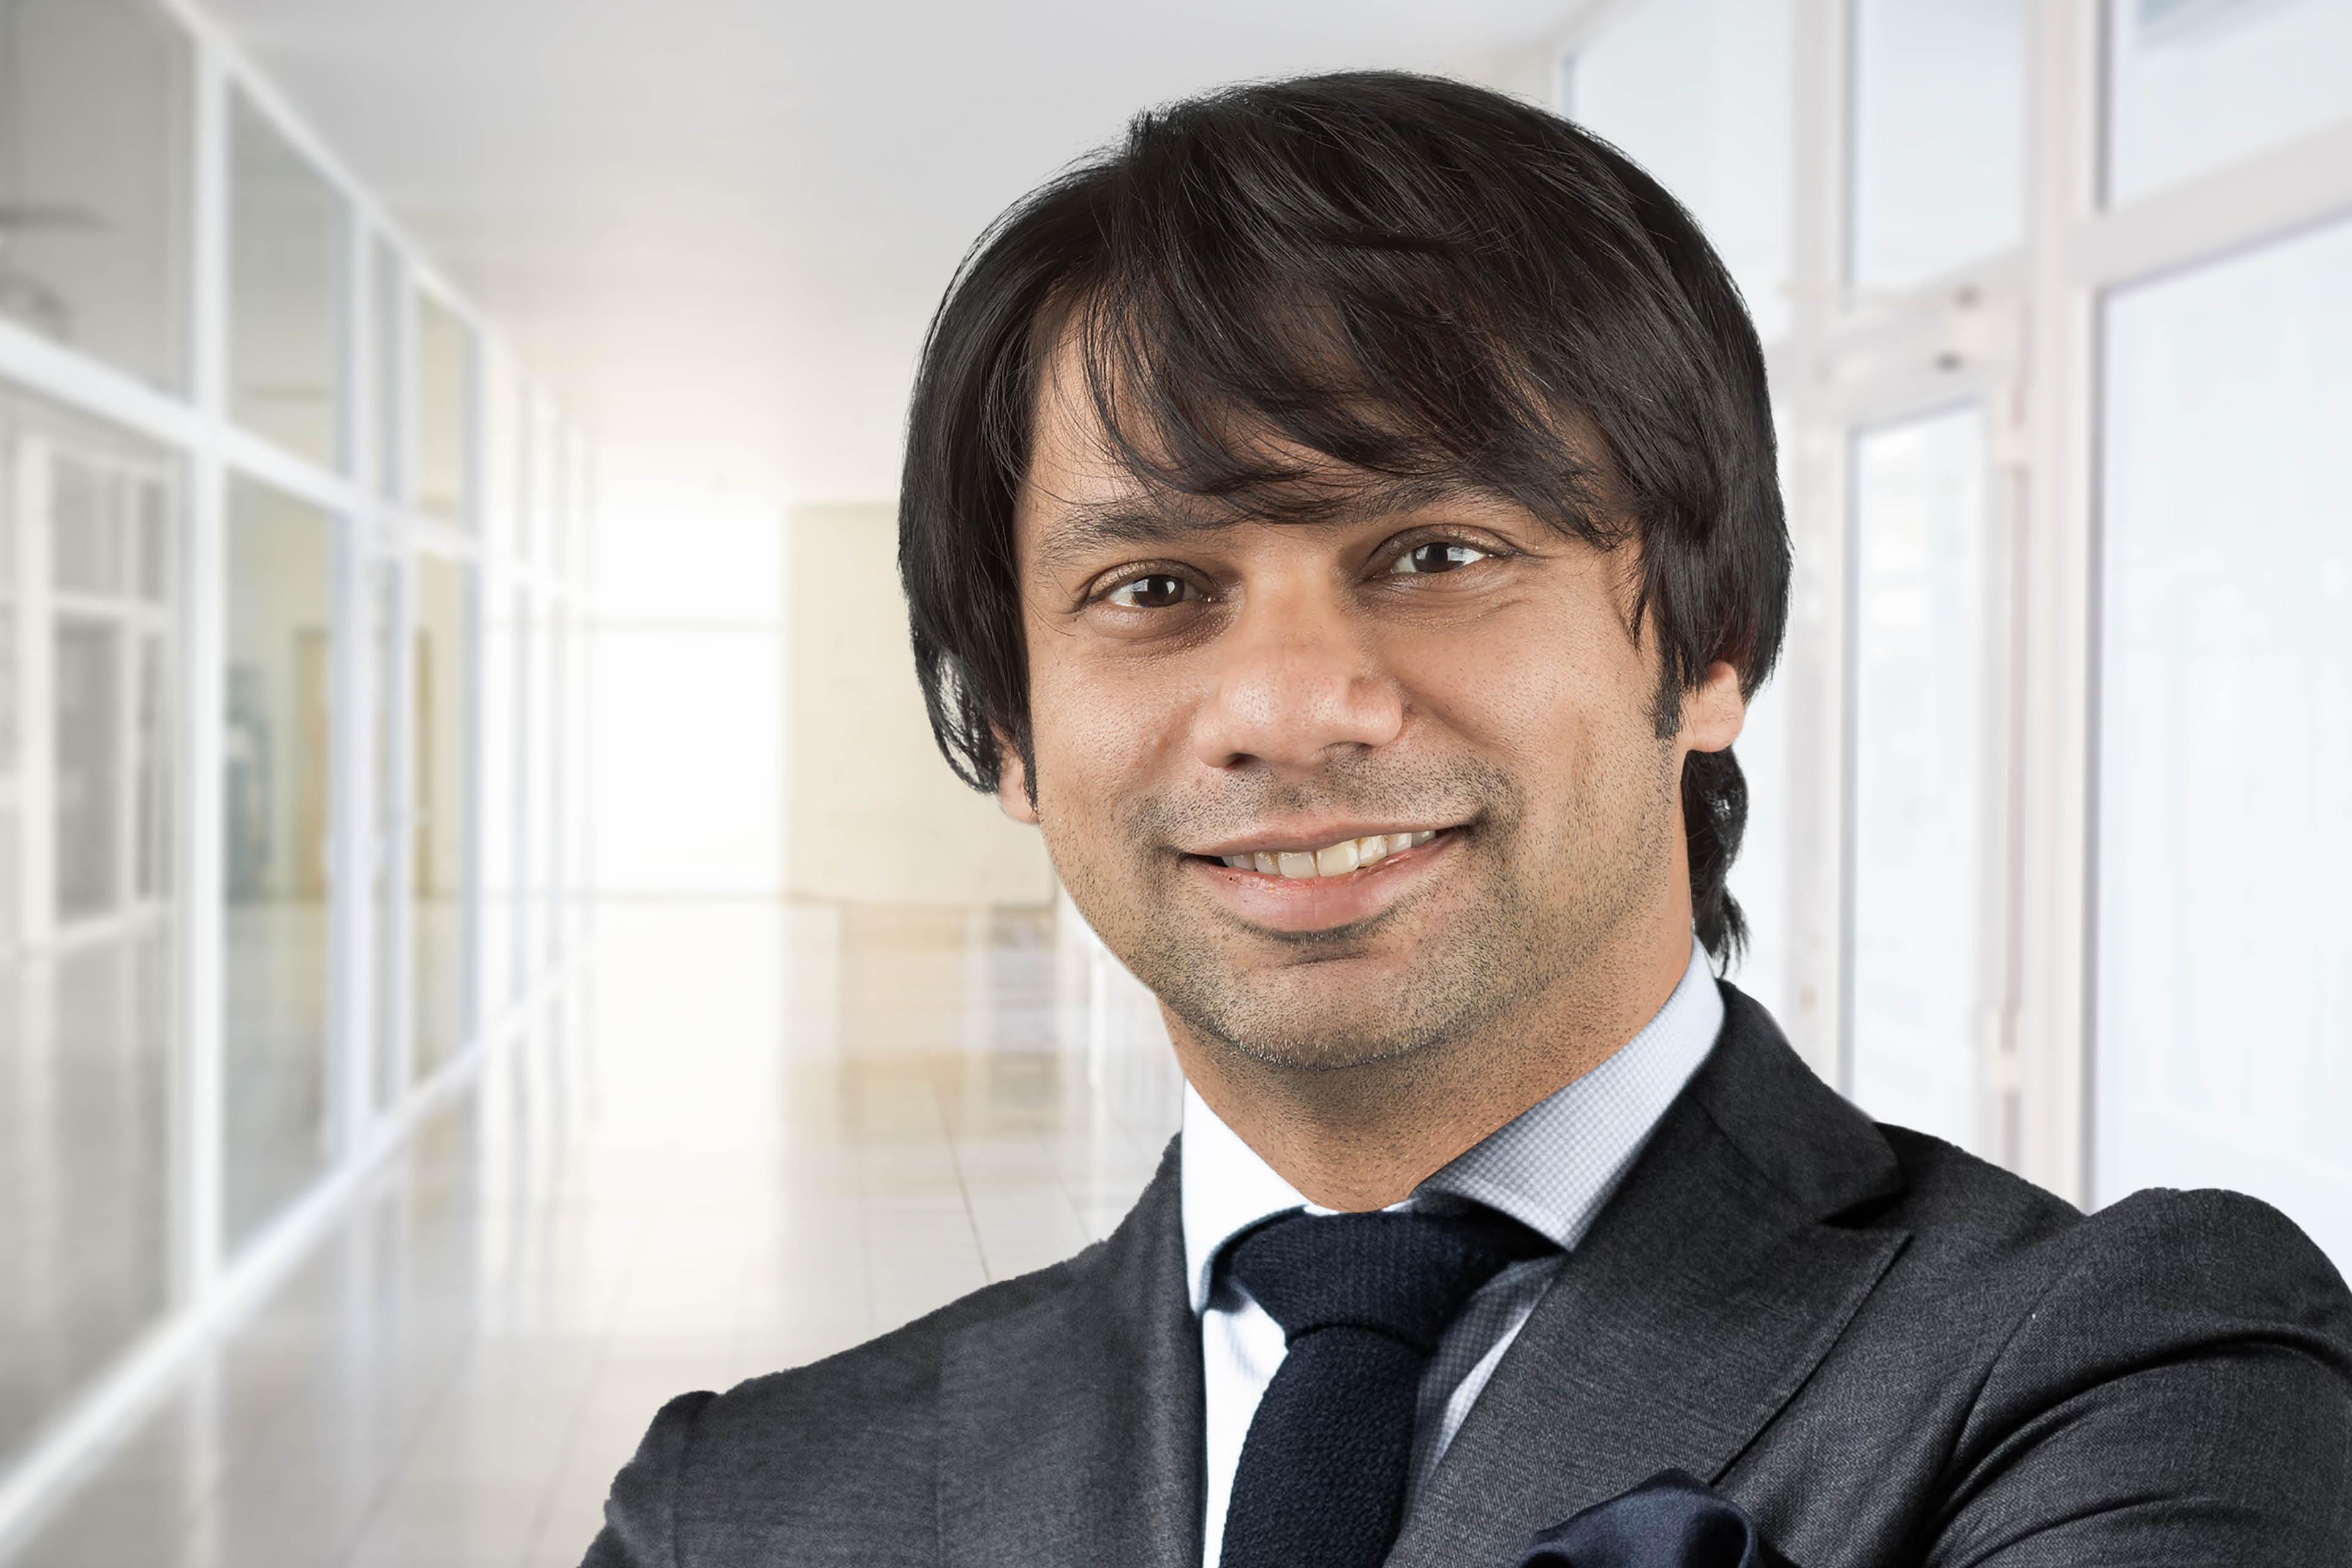 Guarav-Shah